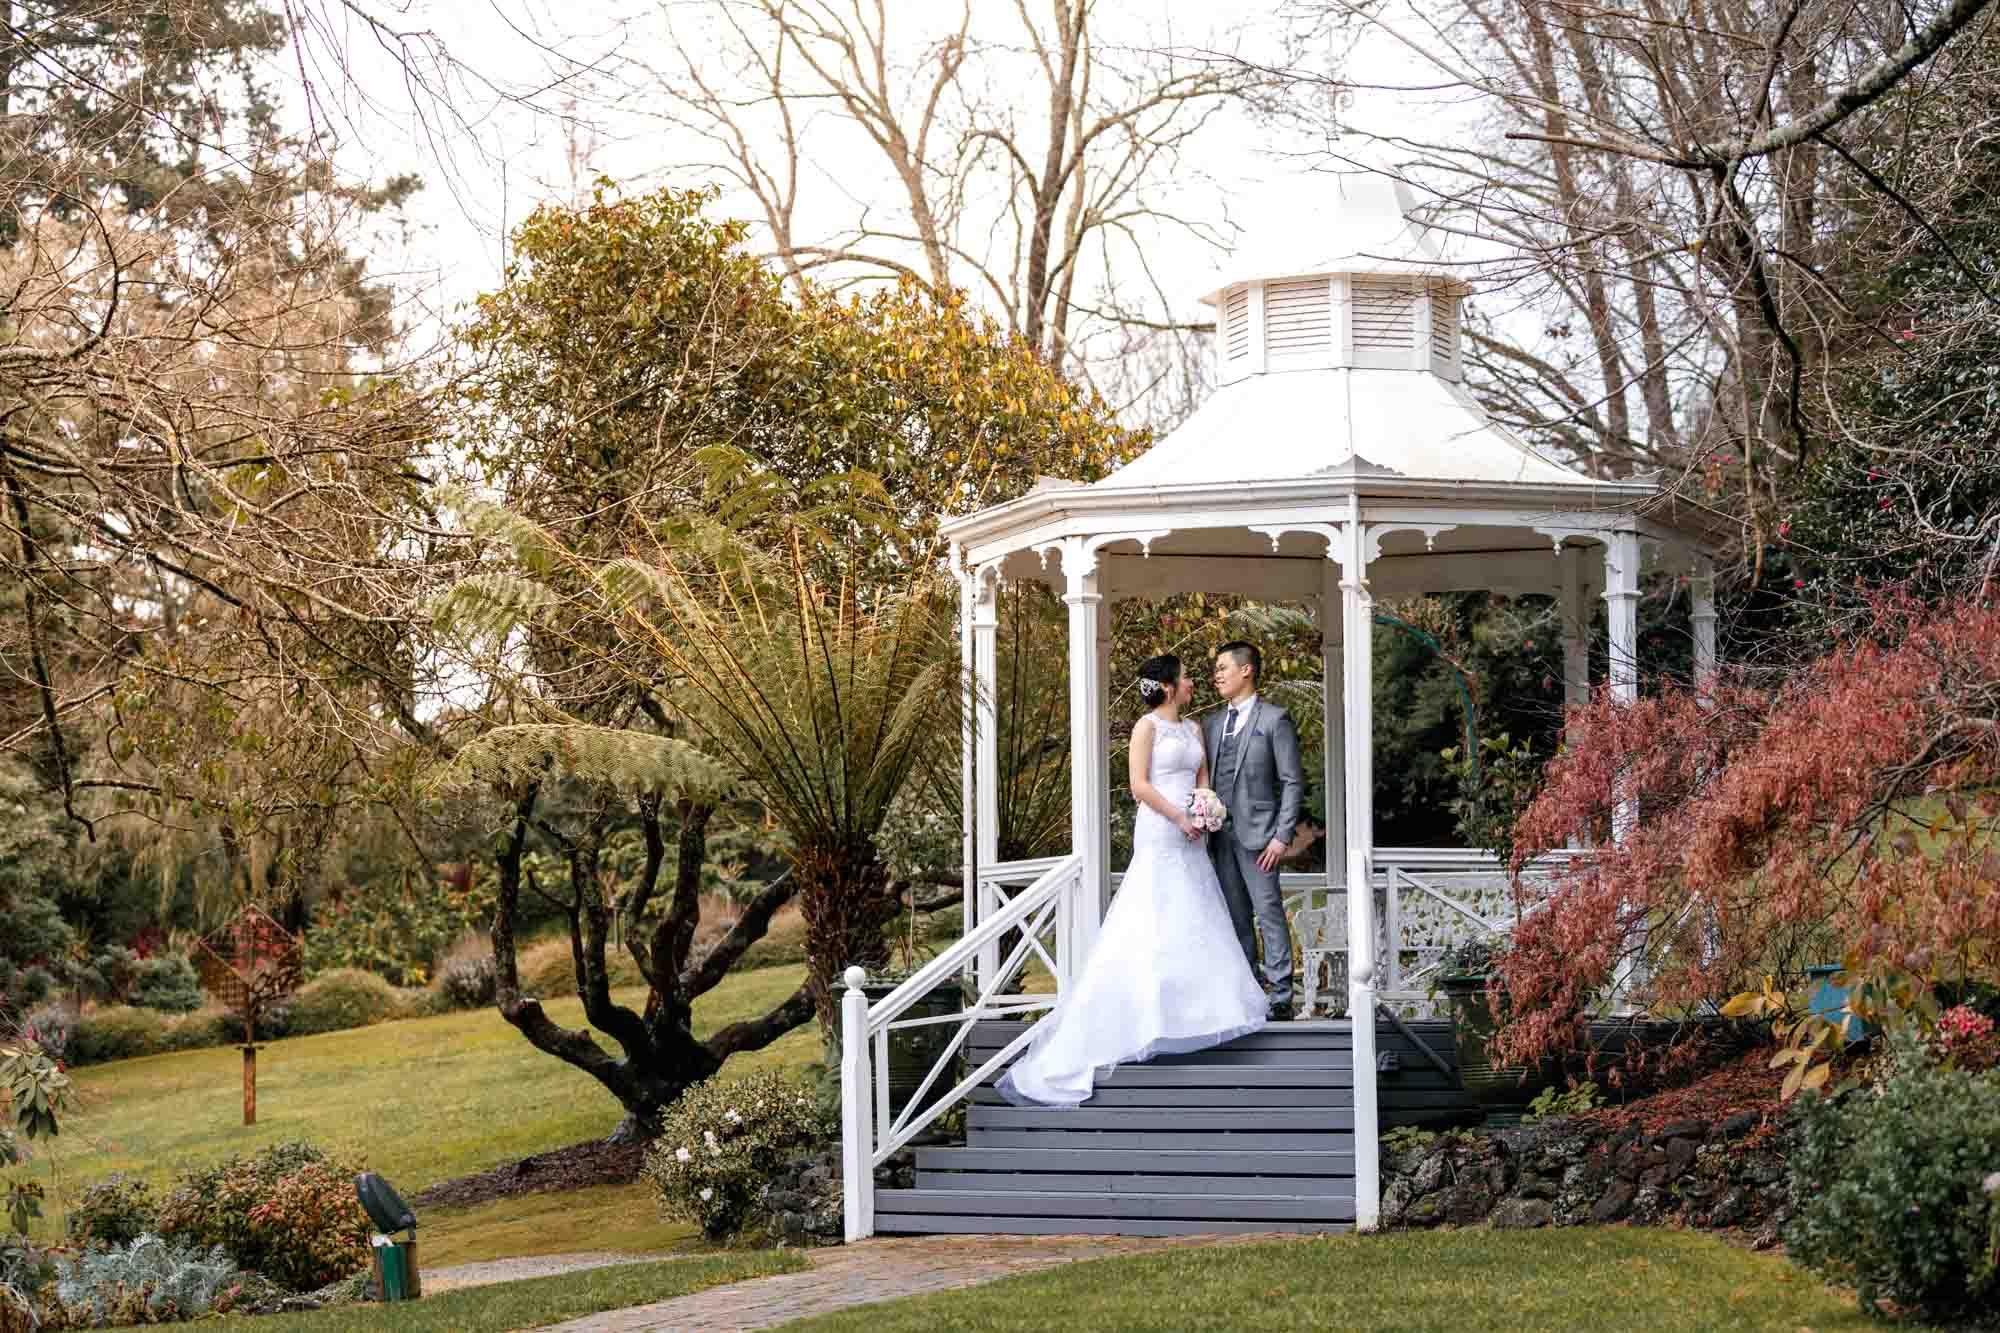 ©Sherman Tan Studio_Melbourne Wedding Photographer_Best Portrait Locations_Paul & Rowenia_02_Pre-Ceremony_105.jpg